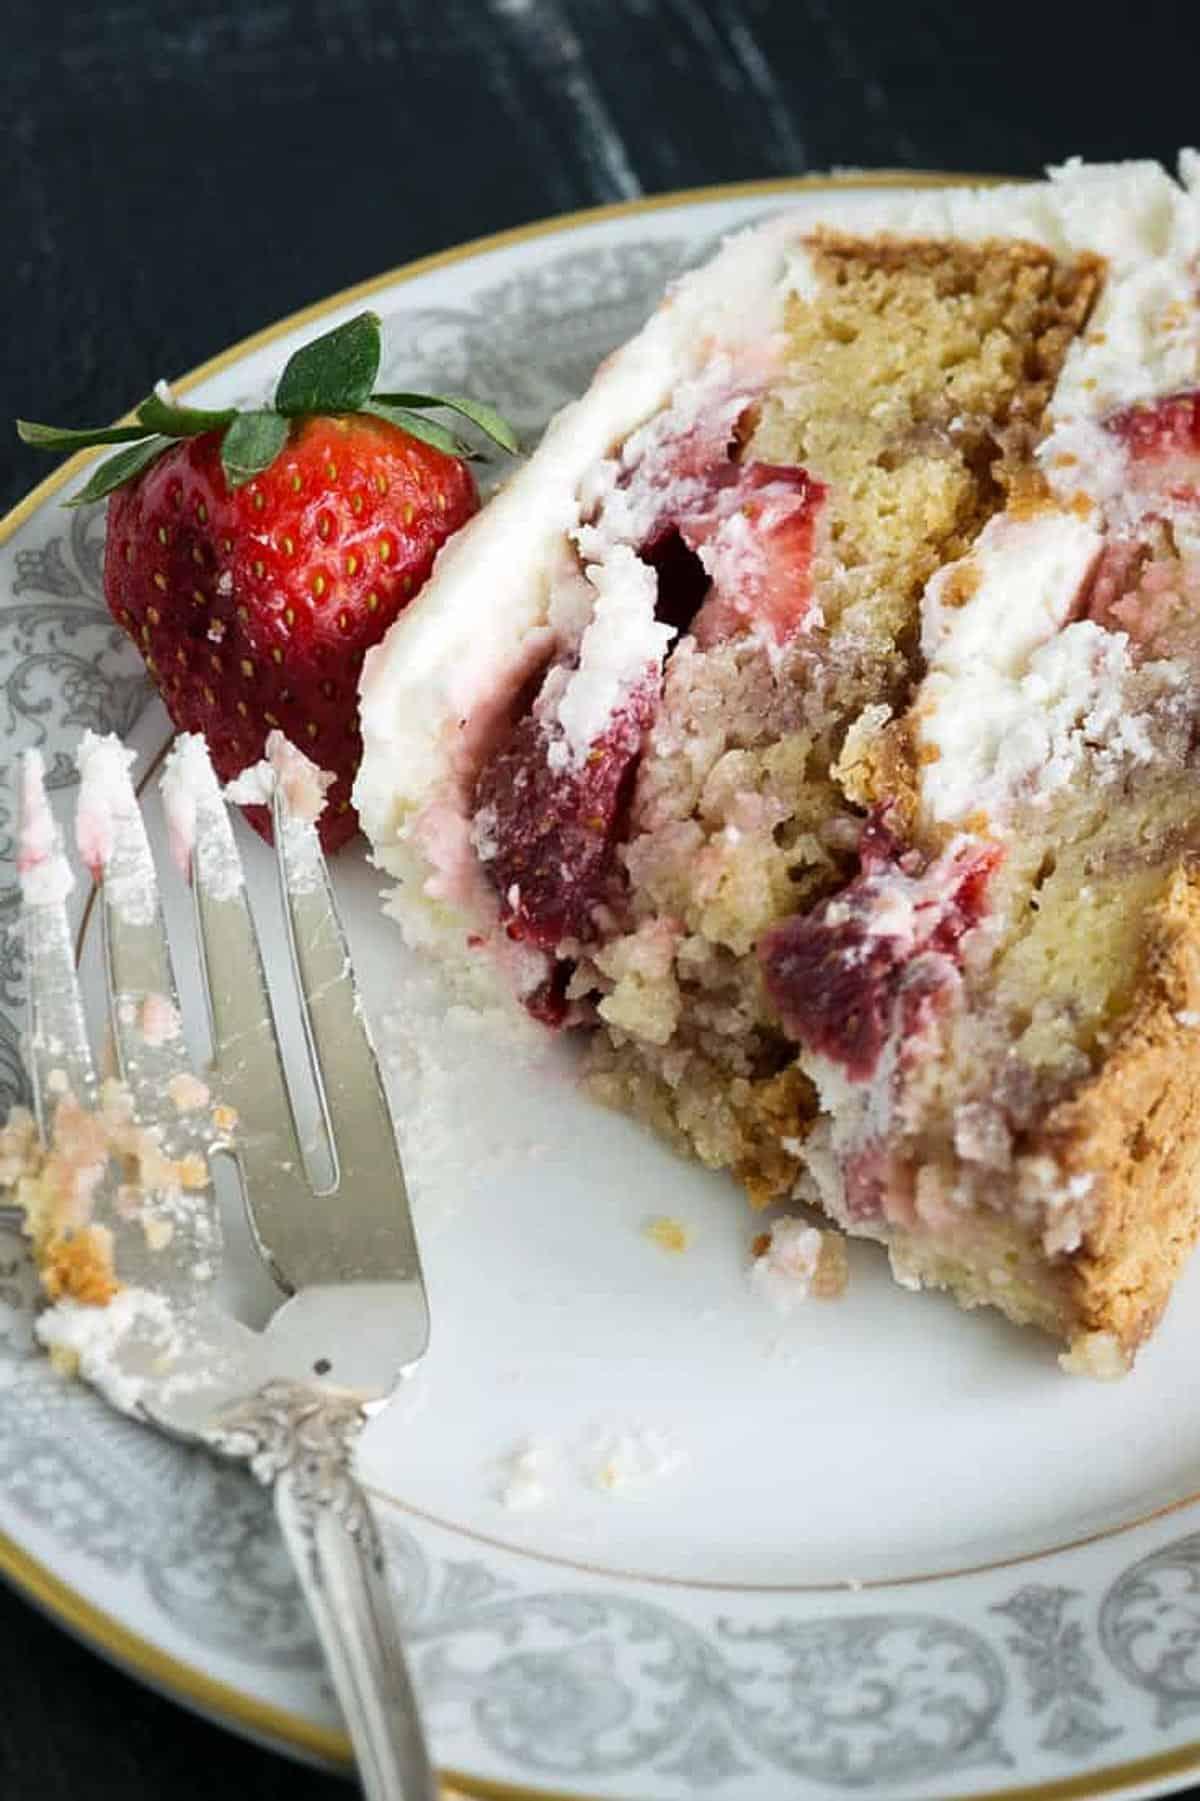 A half eaten slice of strawberry shortcake